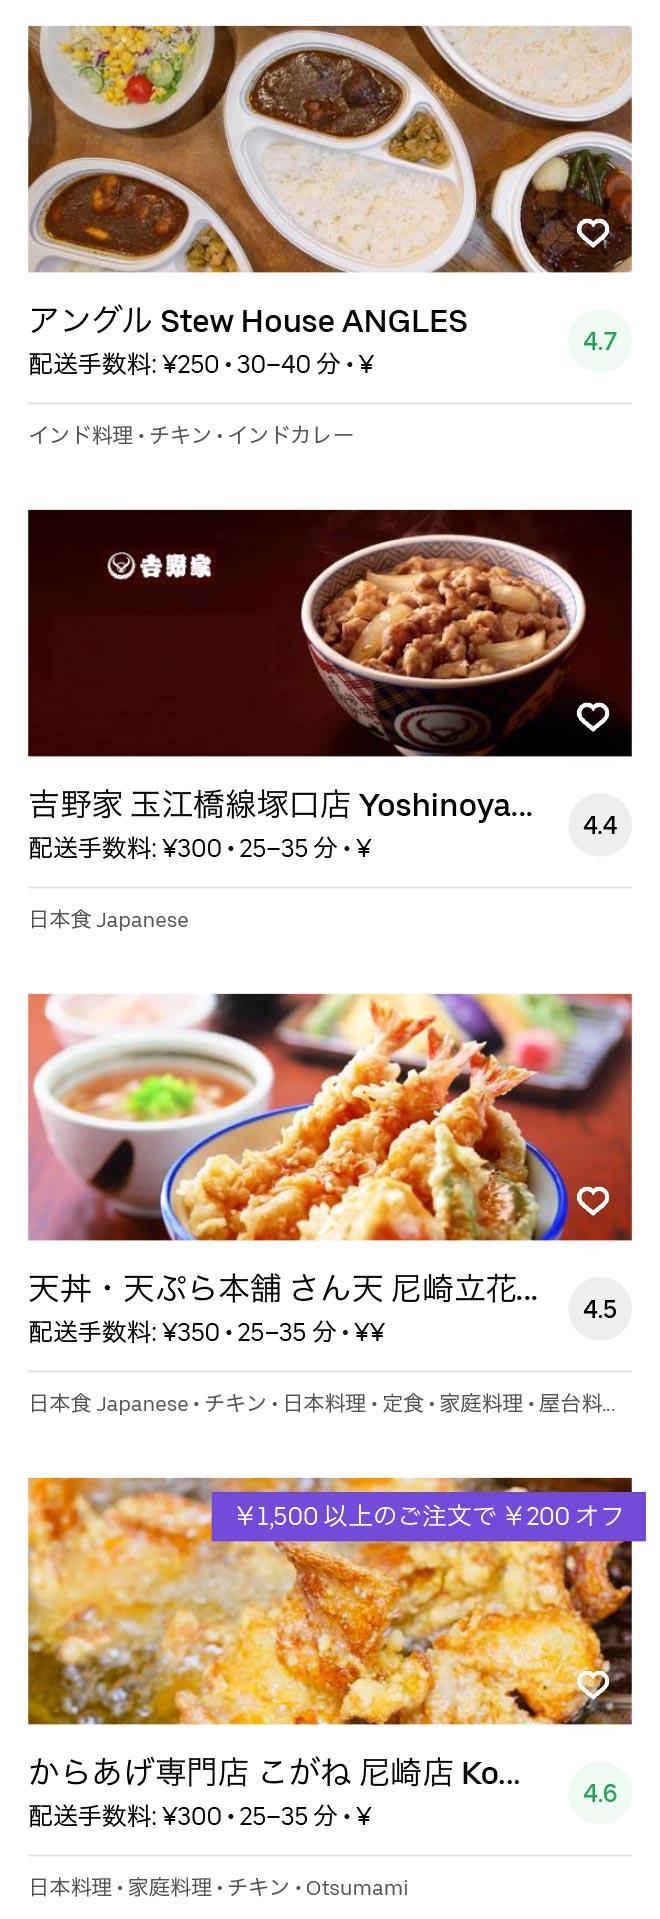 Amagasaki menu 2005 05